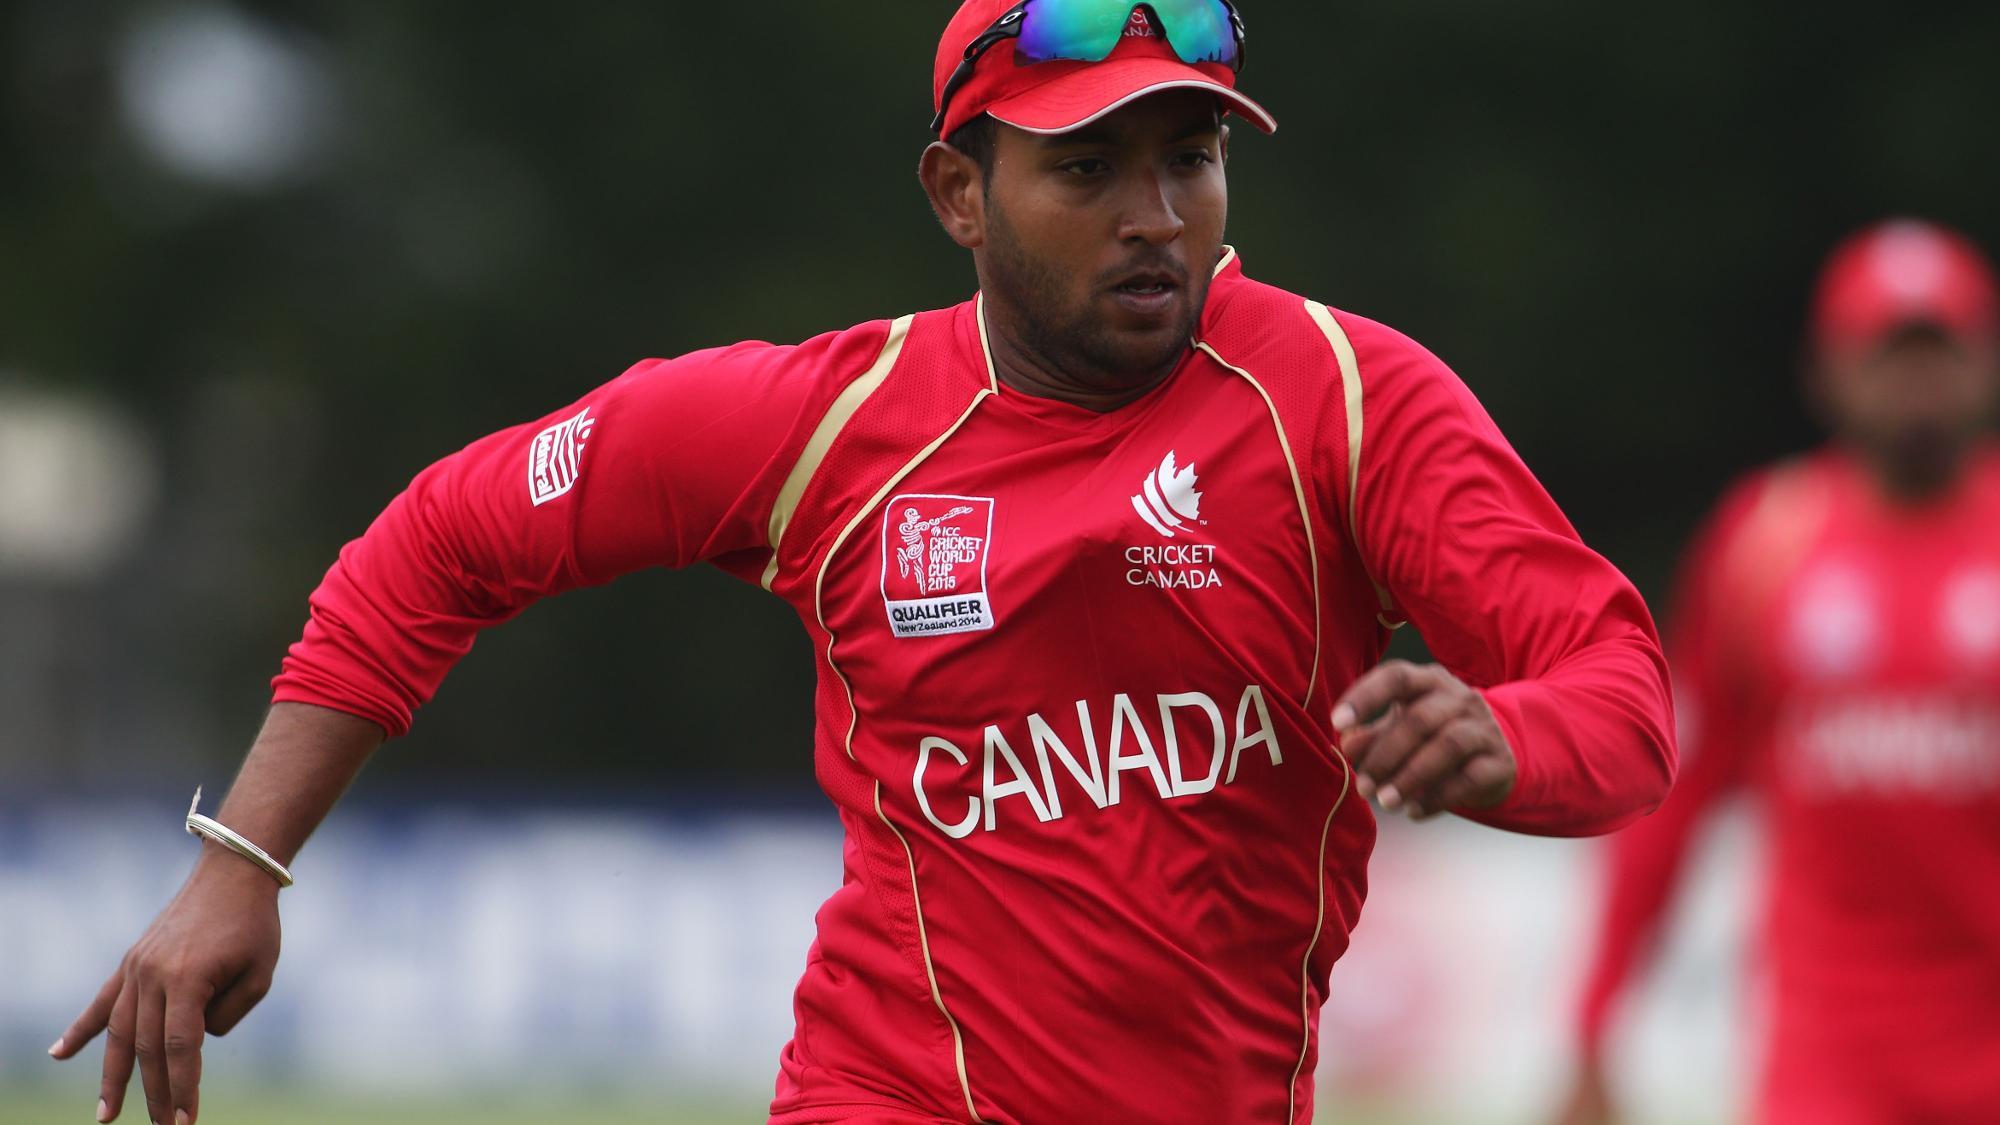 Canada cricketer